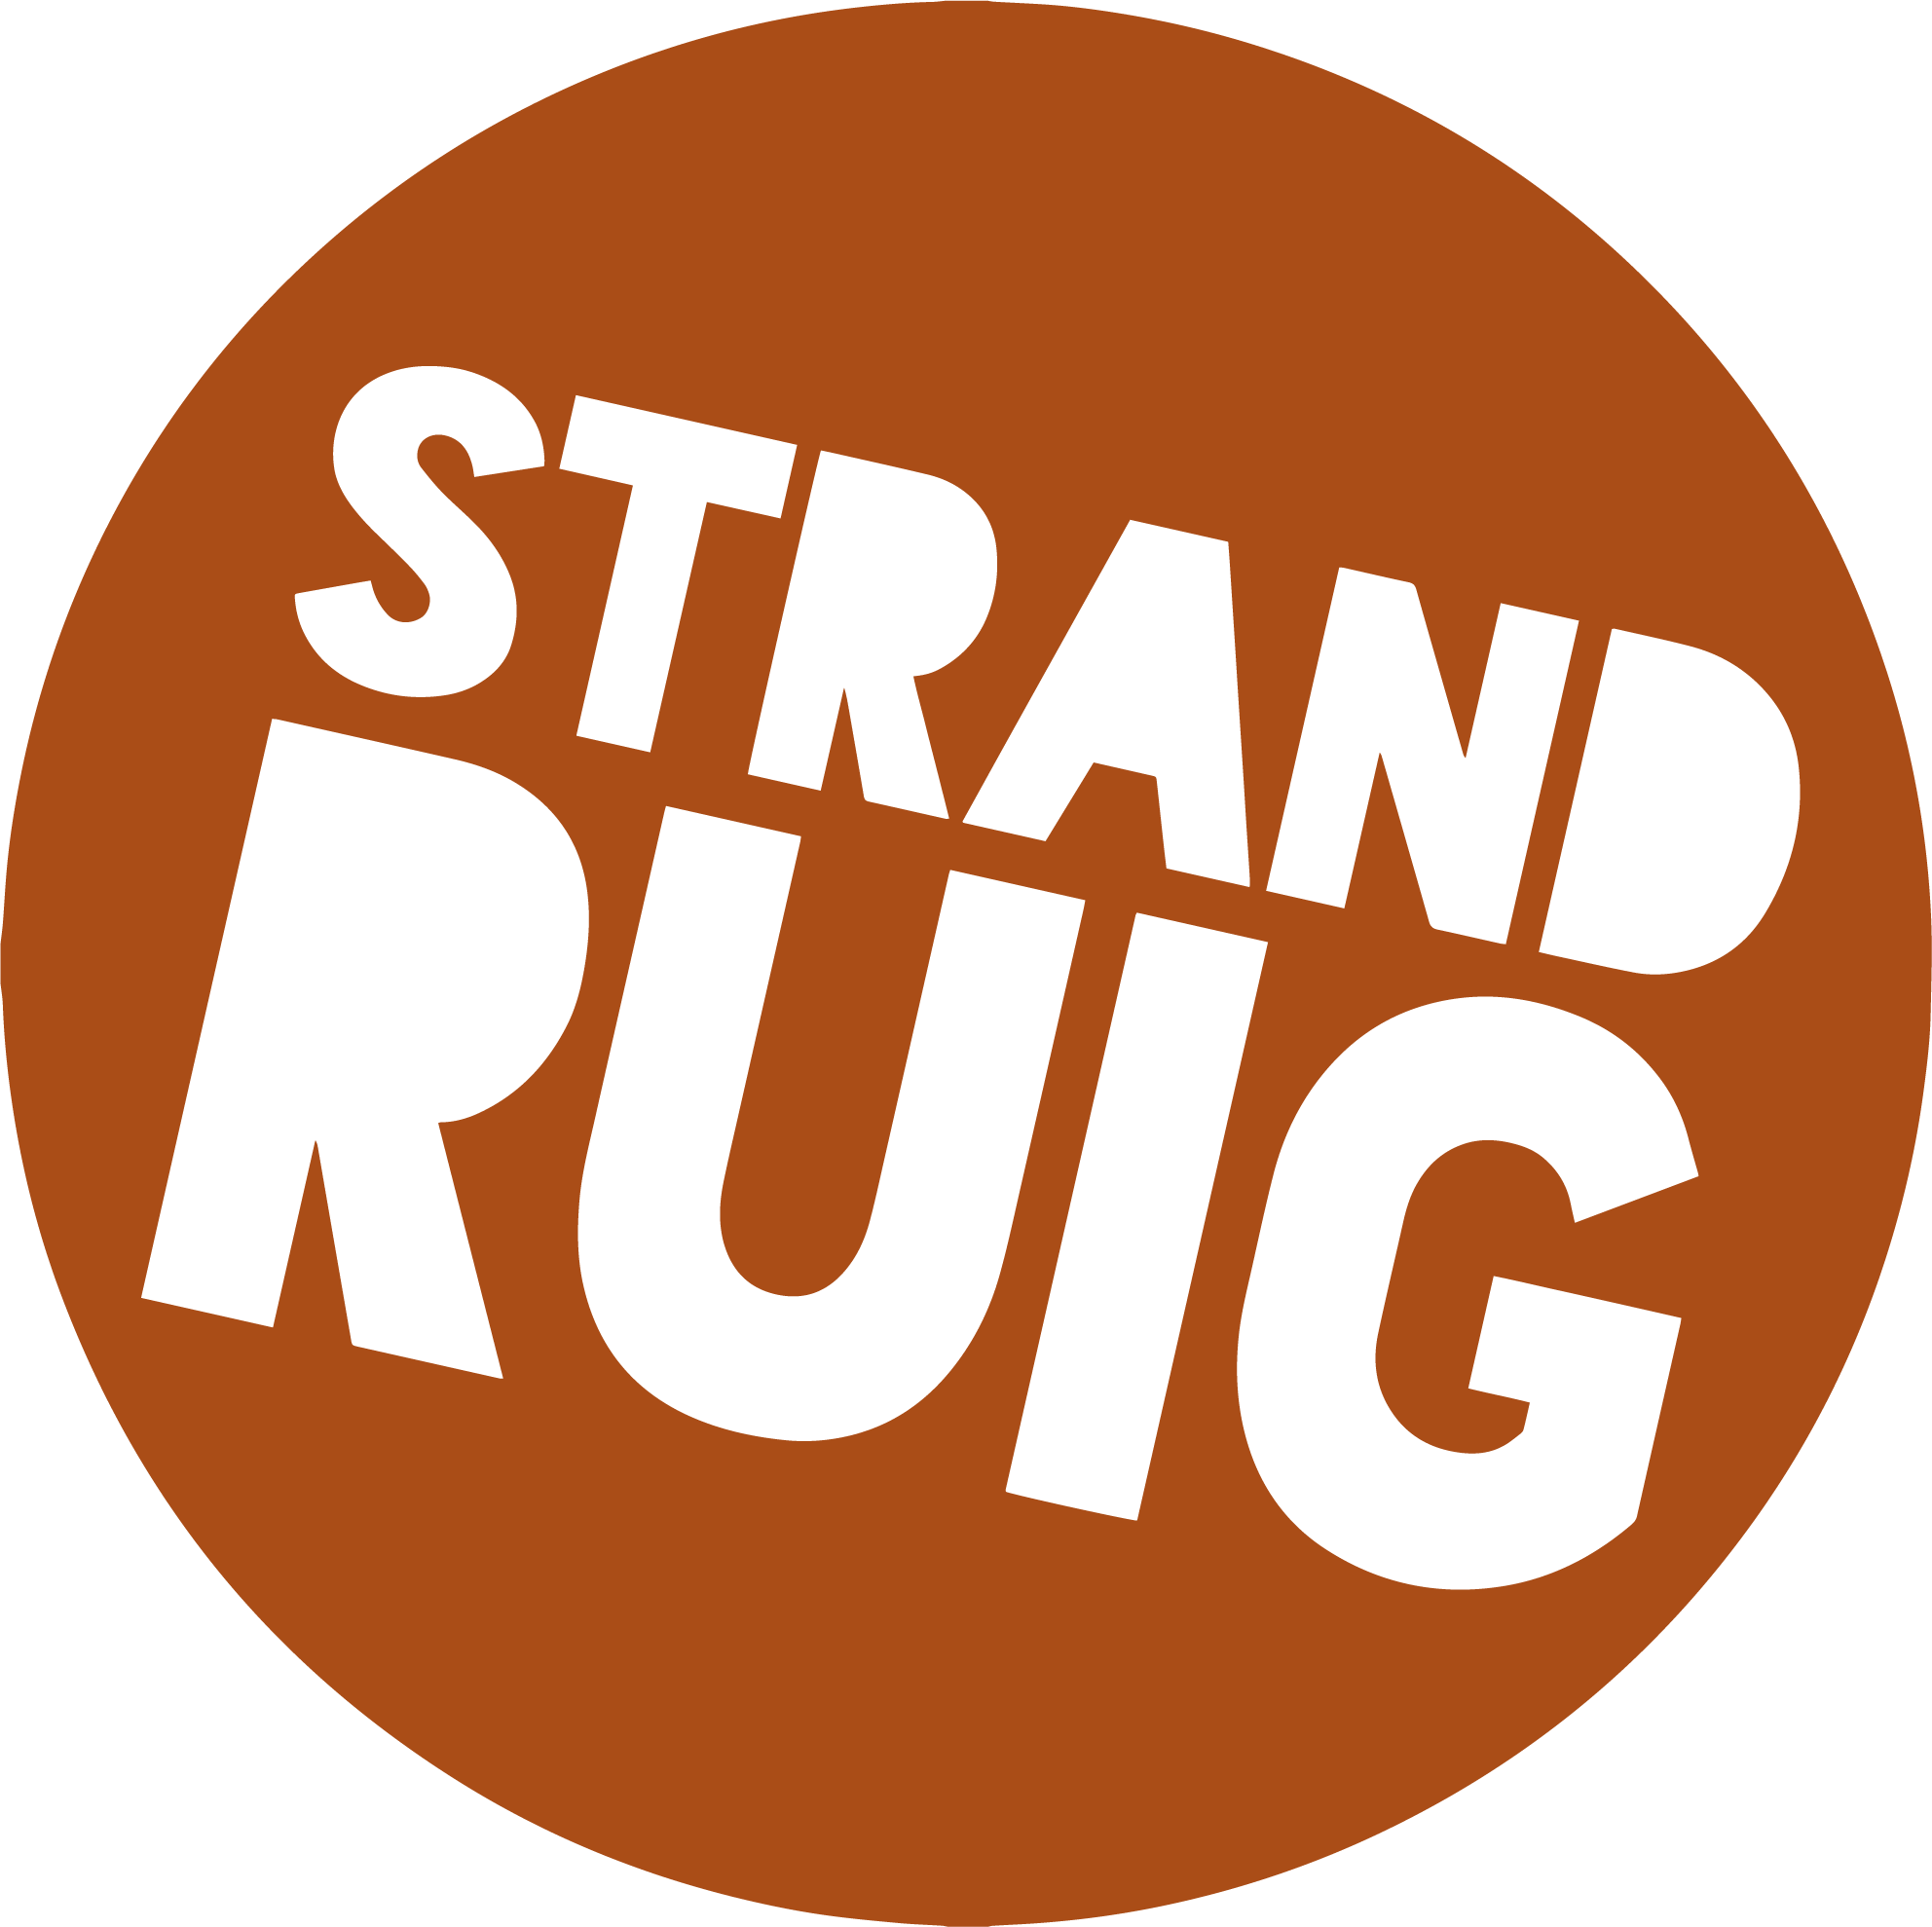 Strand Ruig